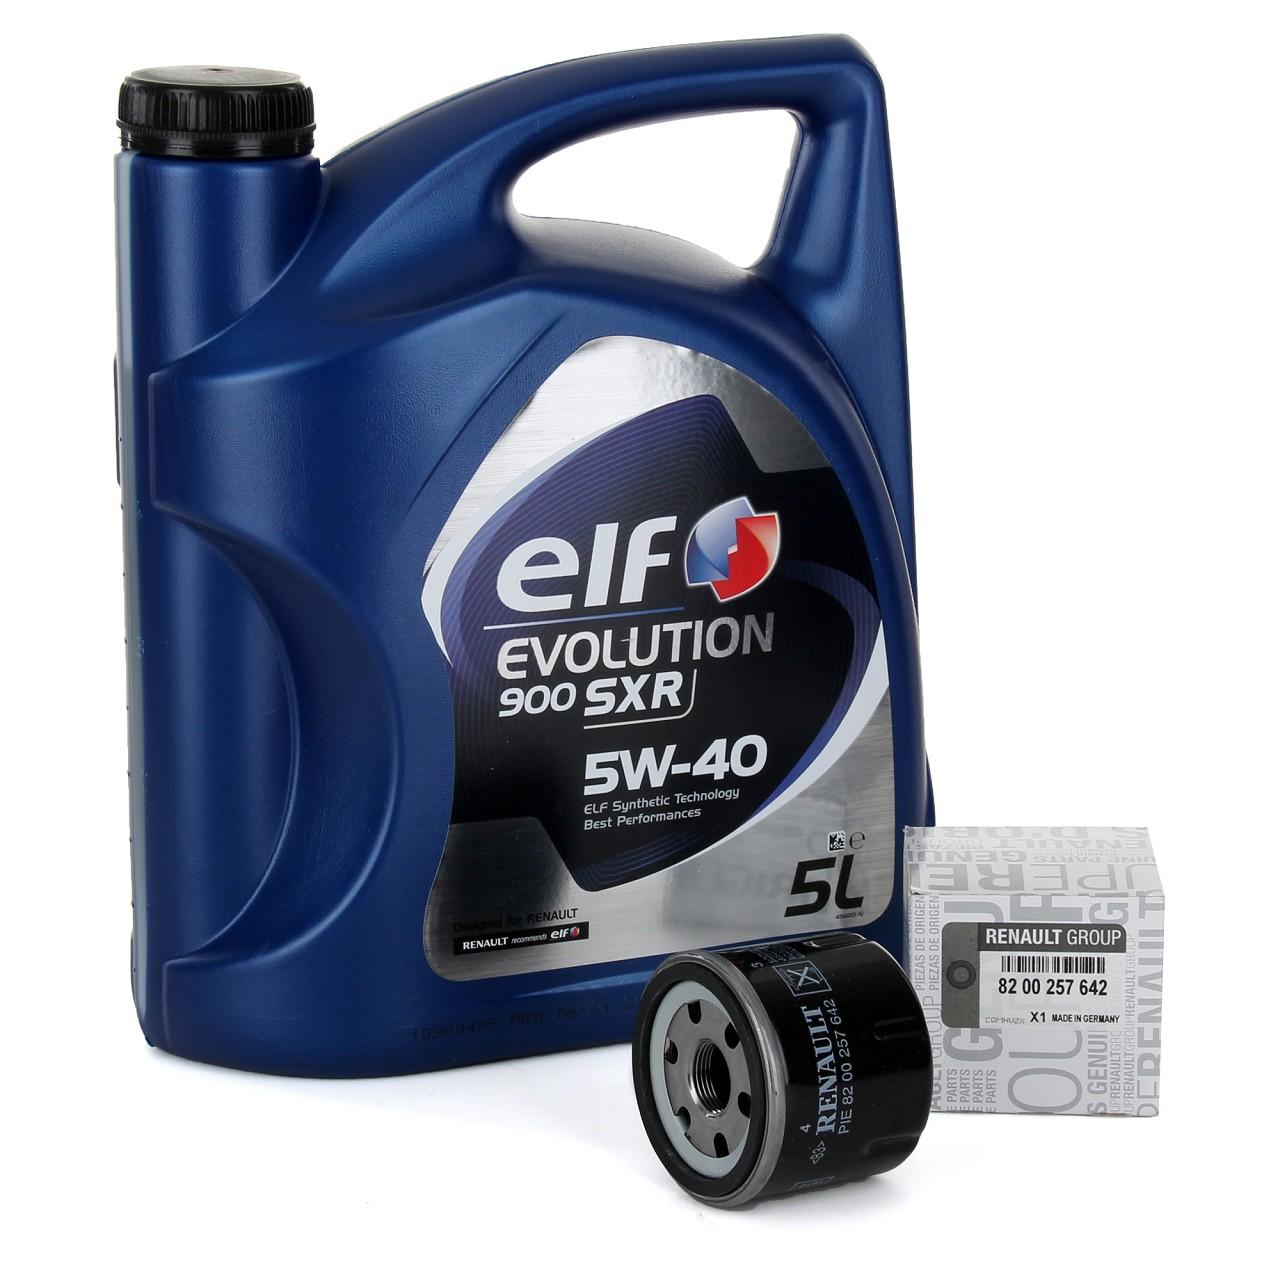 5L elf Evolution 900 SXR 5W-40 Motoröl + ORIGINAL Renault Ölfilter 8200257642